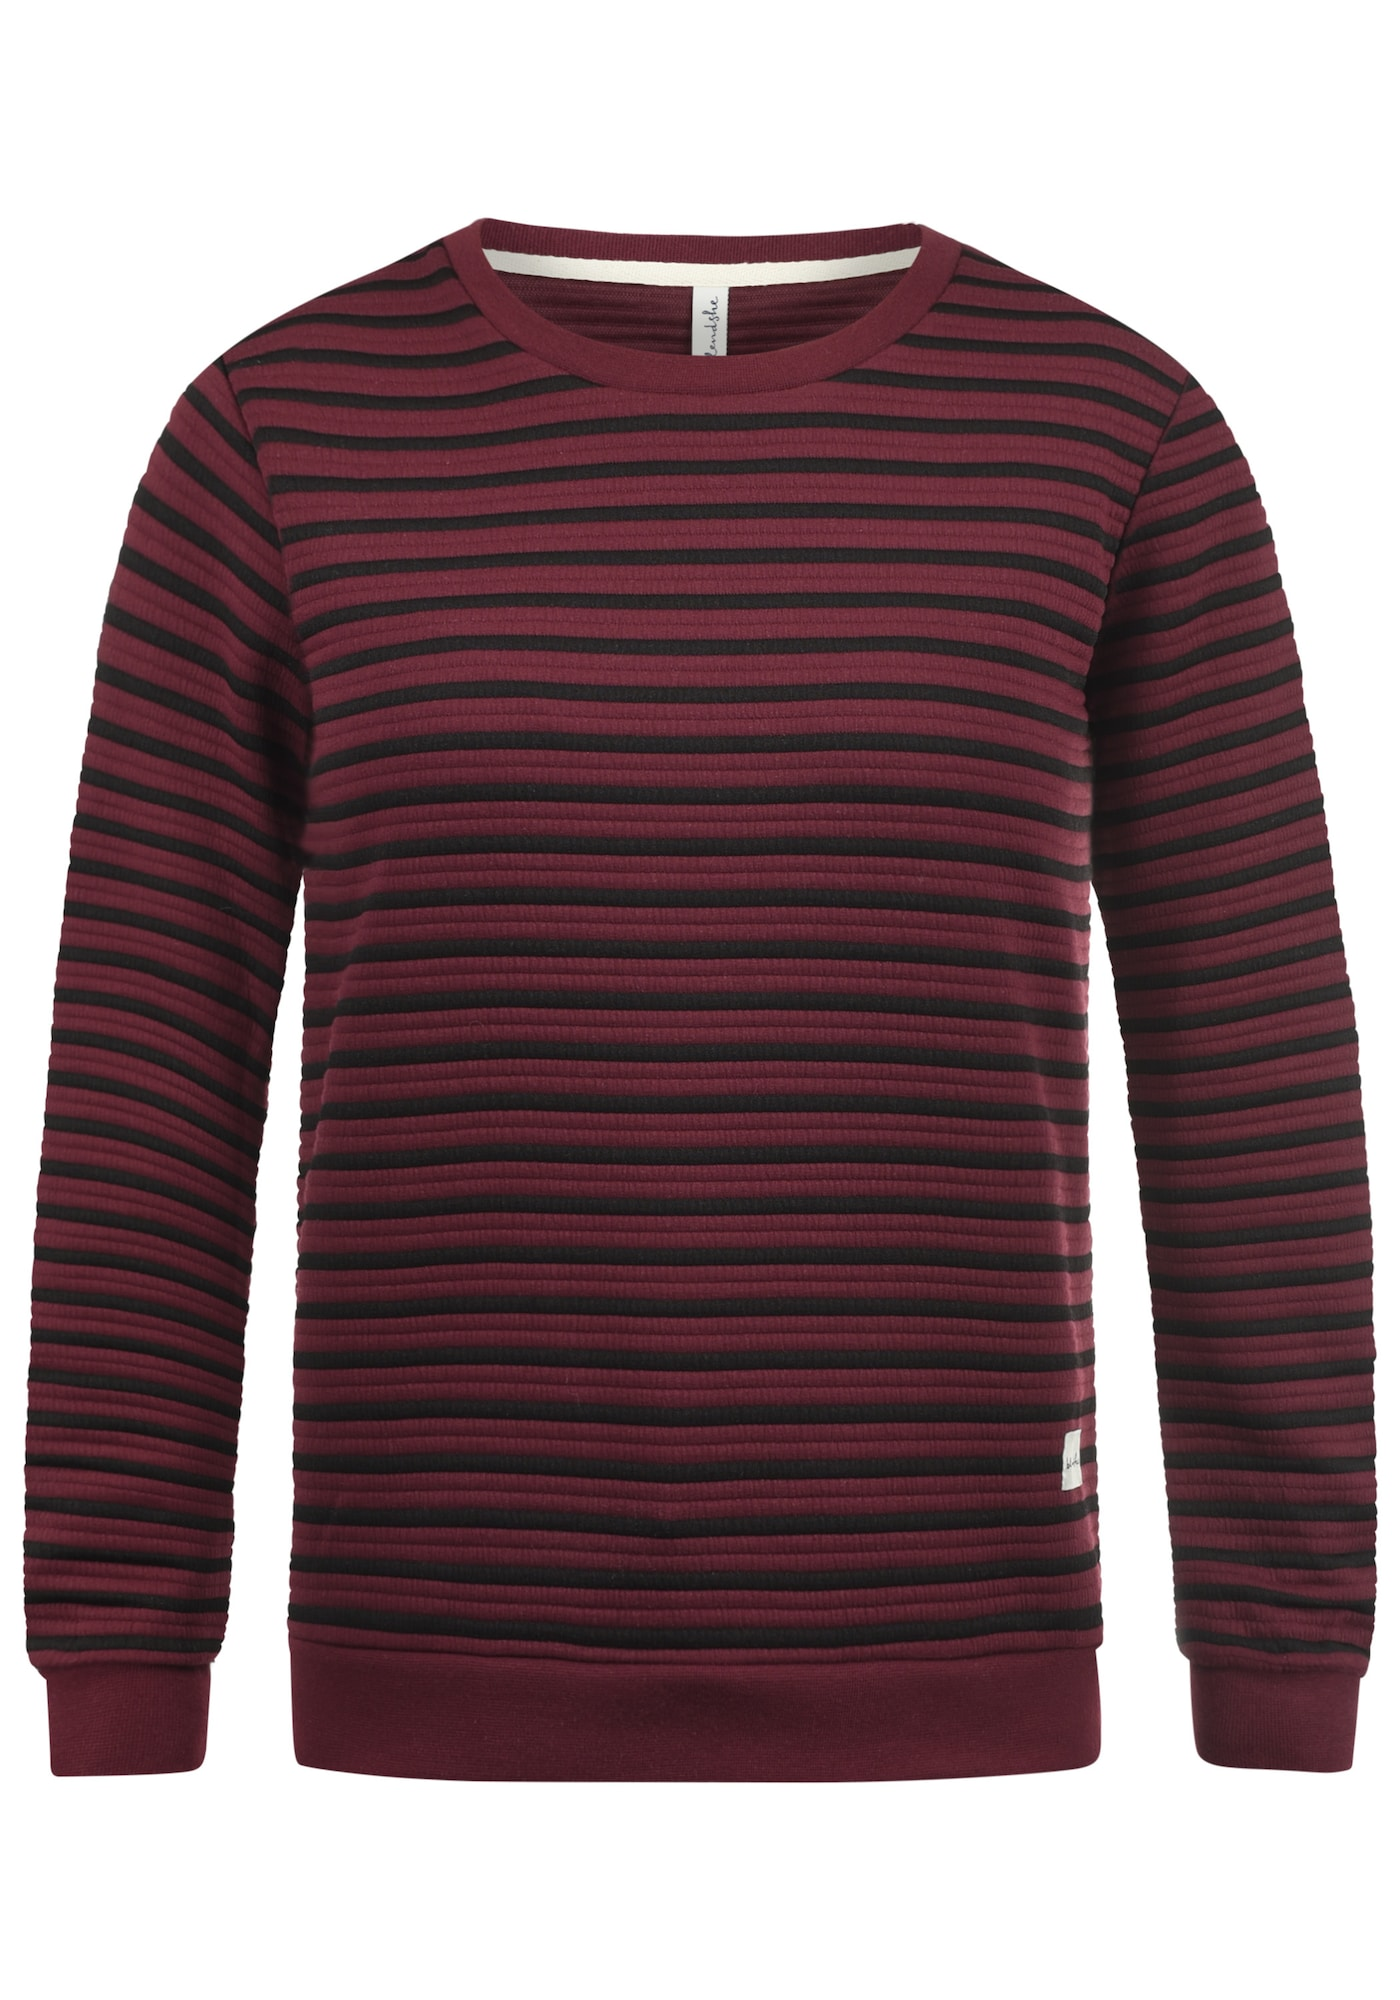 Sweatshirt | Bekleidung > Sweatshirts & -jacken > Sweatshirts | Weinrot - Schwarz | Blend She